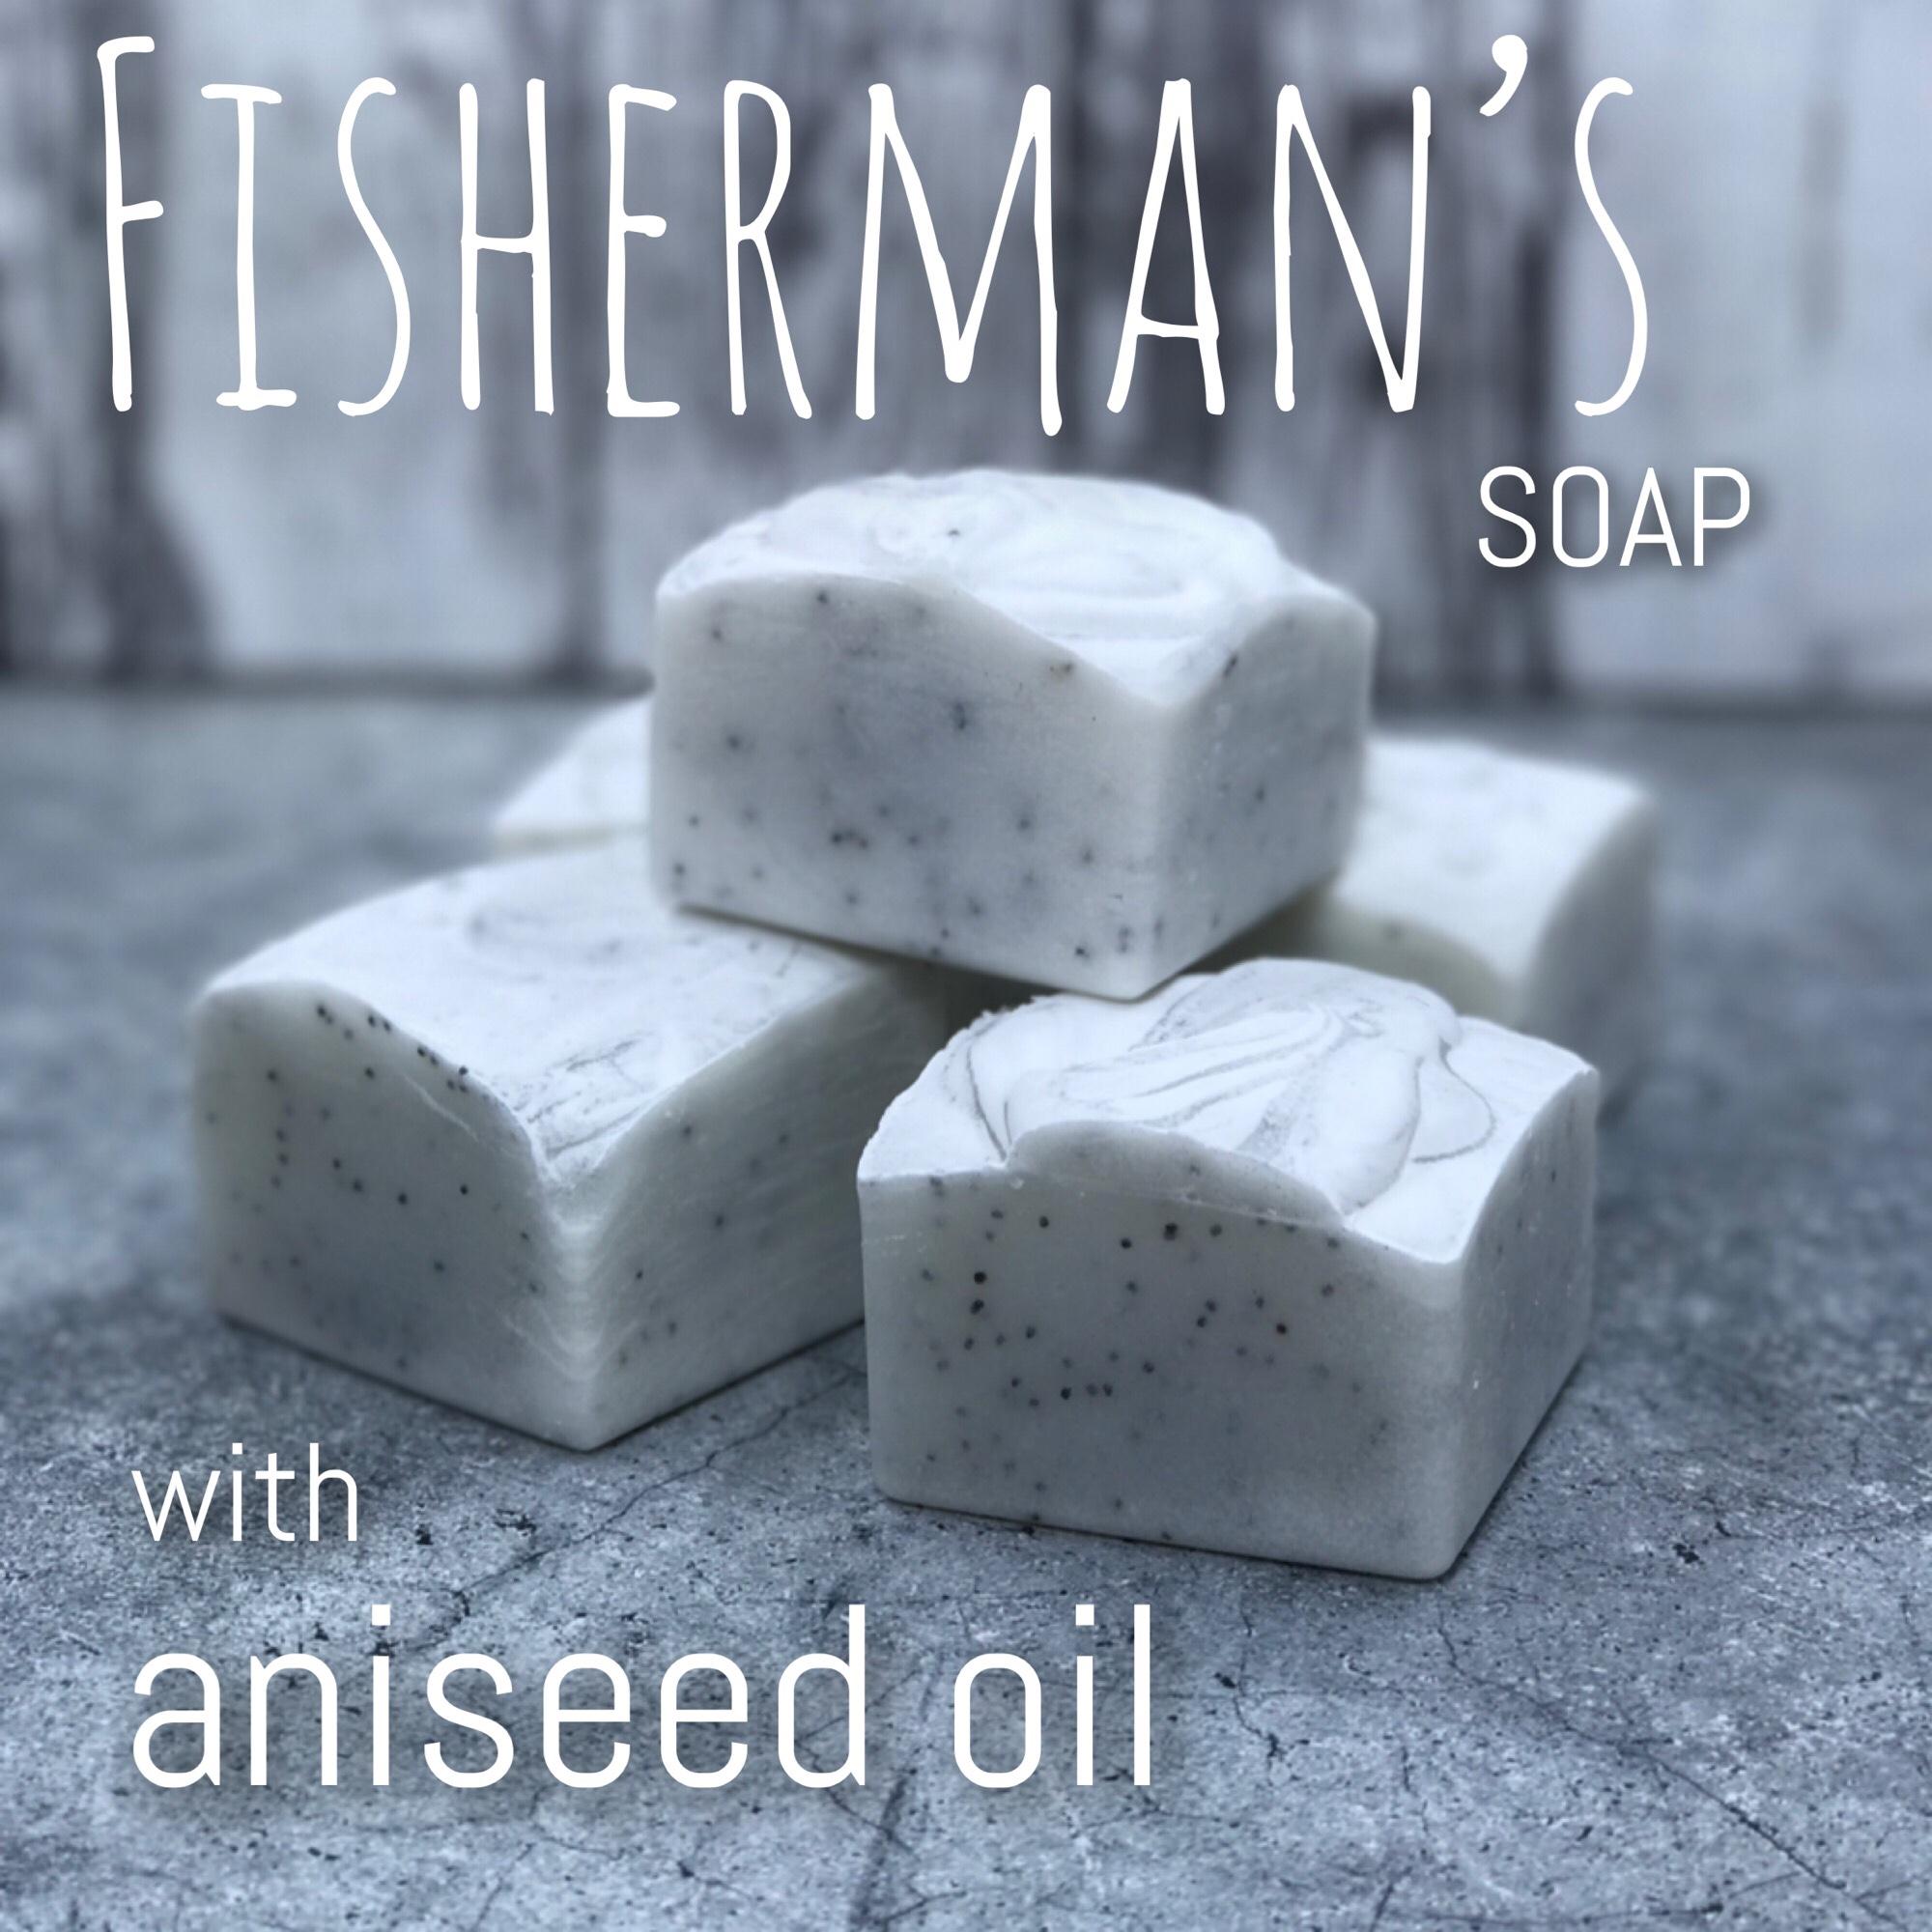 Fishermen soap